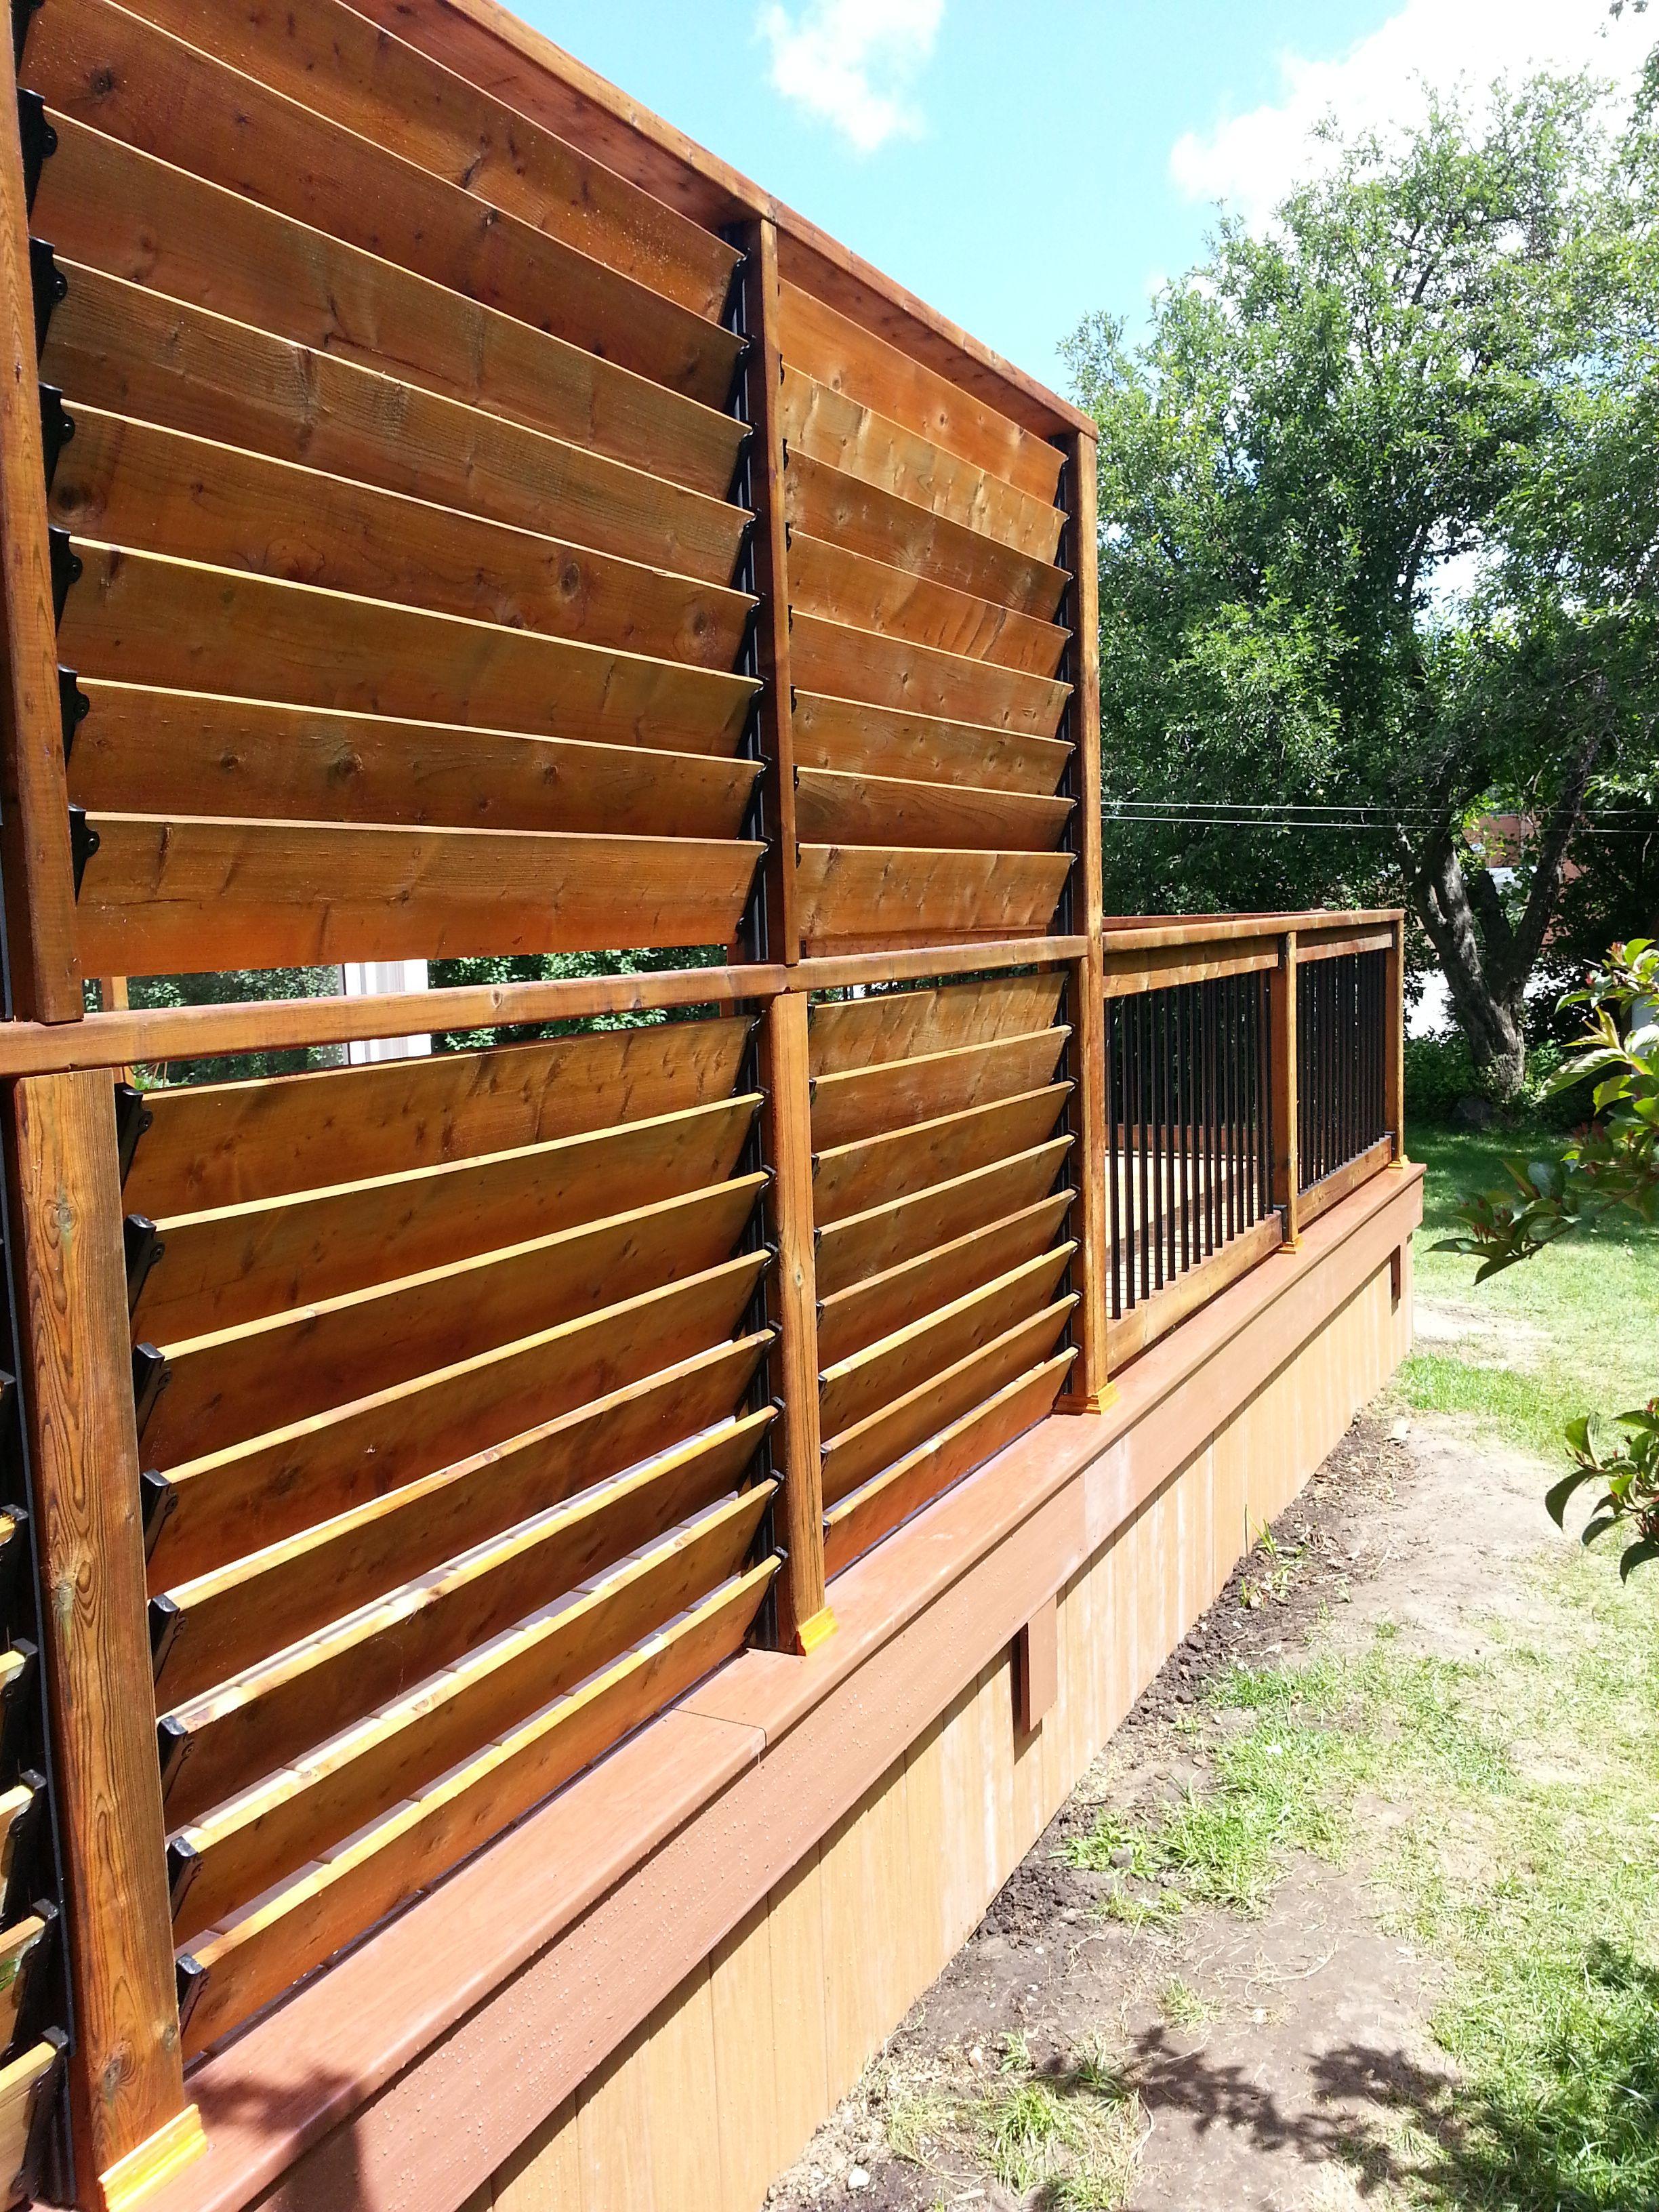 Flexfence creation by thommoknockers custom decks louver extra flexfence creation by thommoknockers custom decks louver extra privacy deck baanklon Gallery